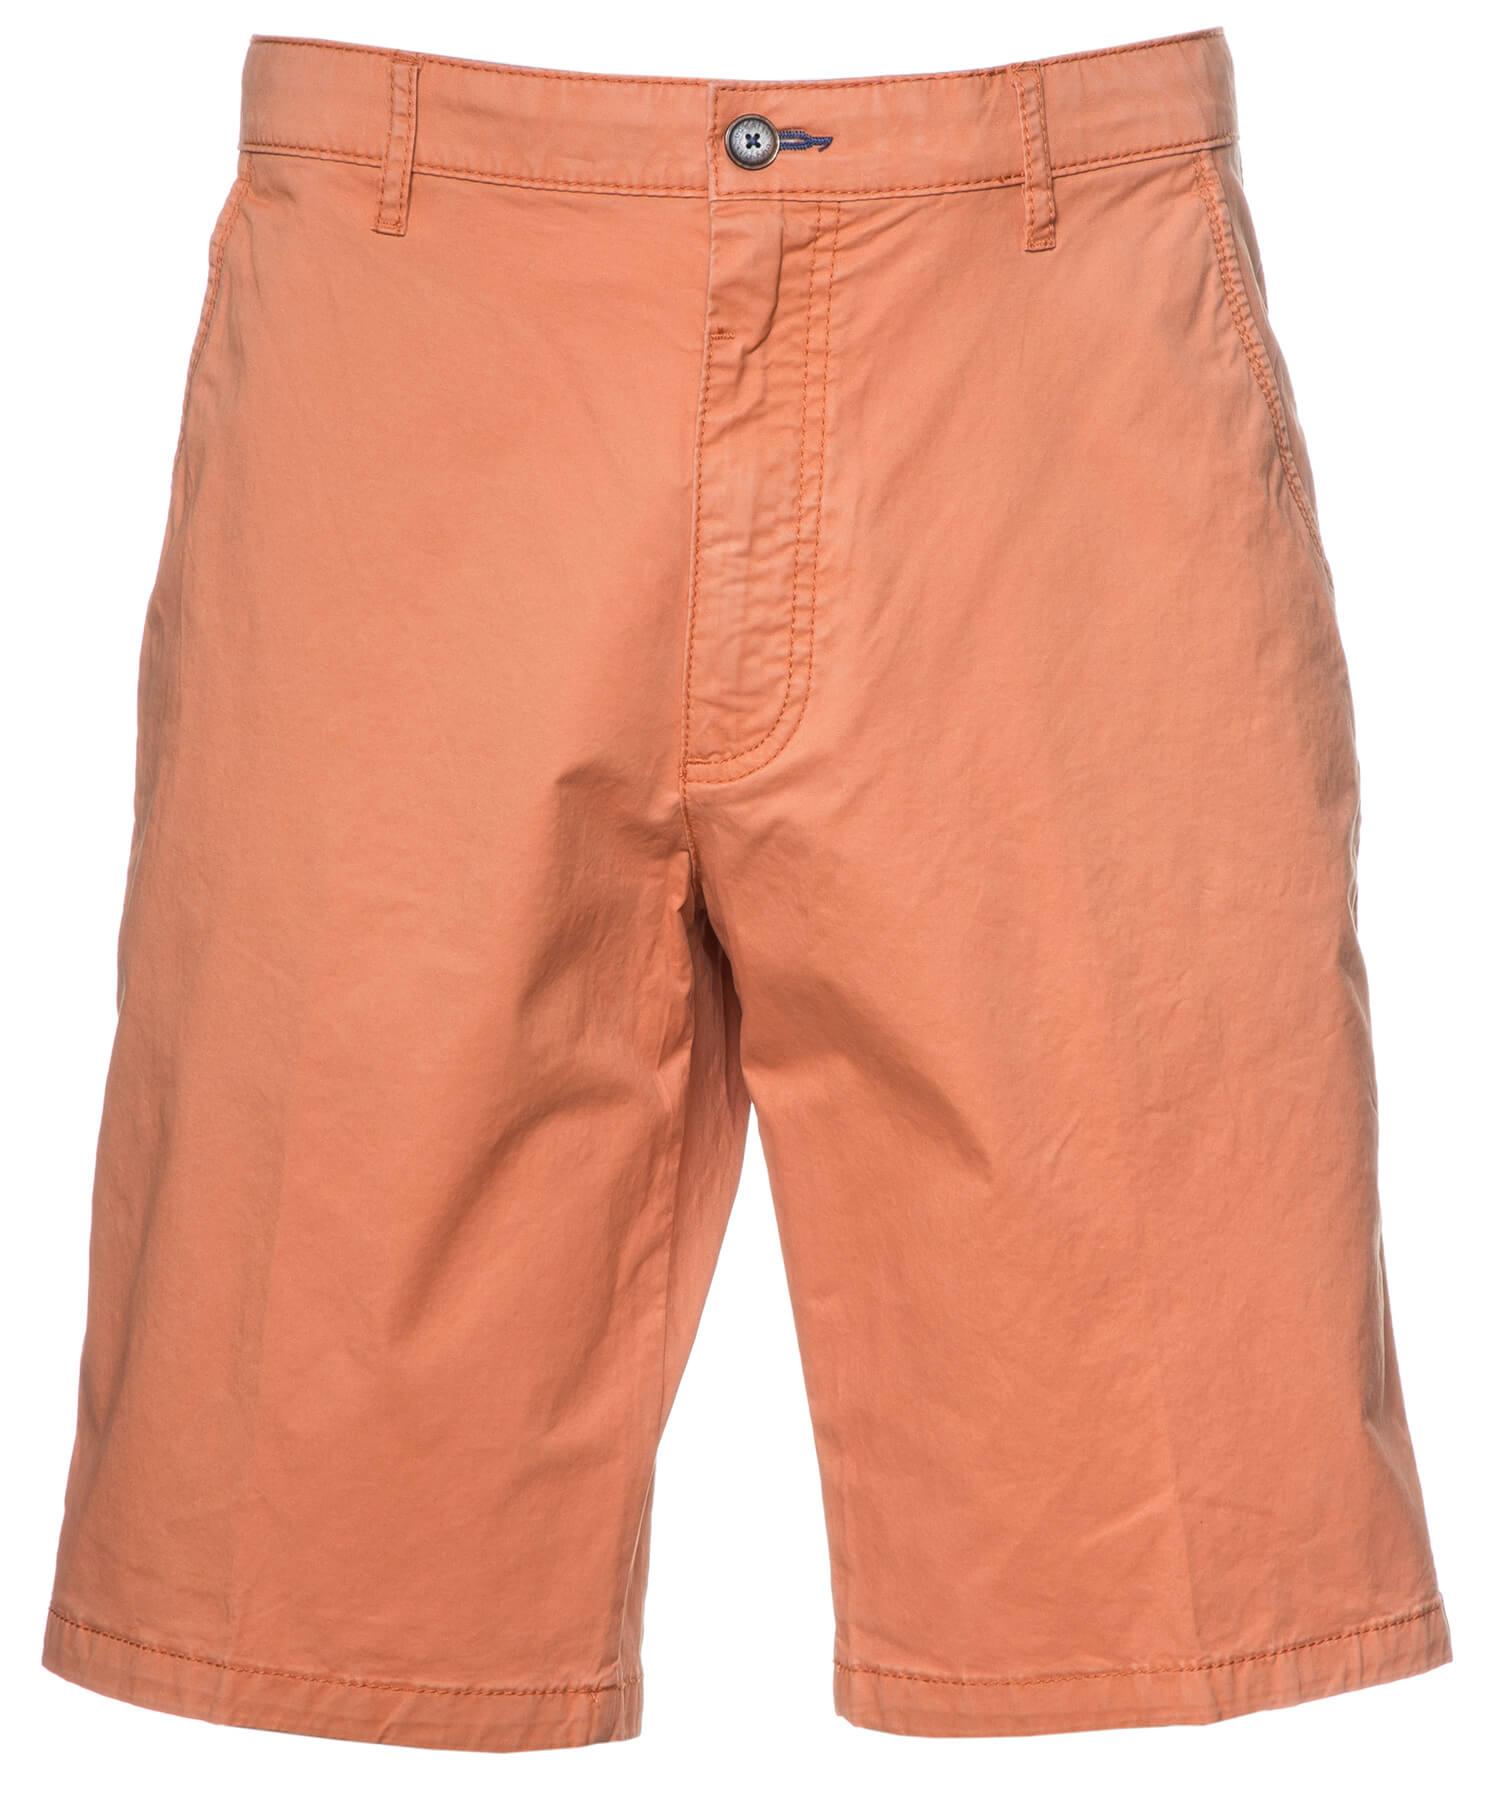 Bugatti Miesten Shortsit Oranssi